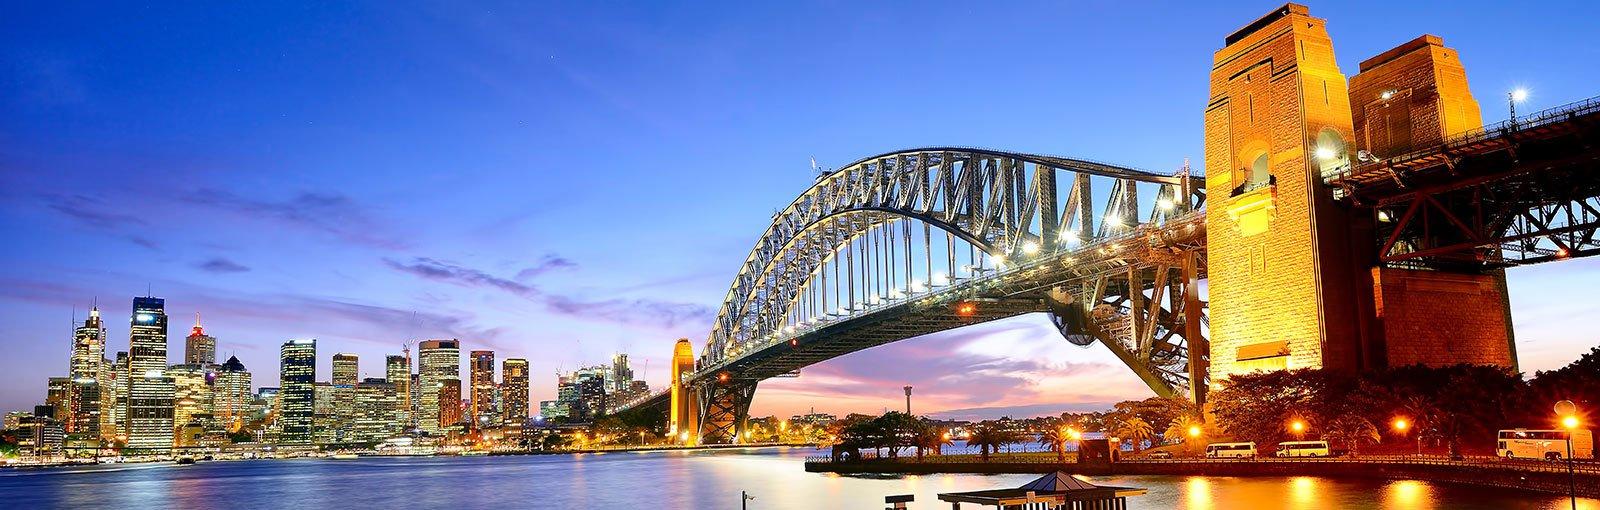 Sydney Data Centres